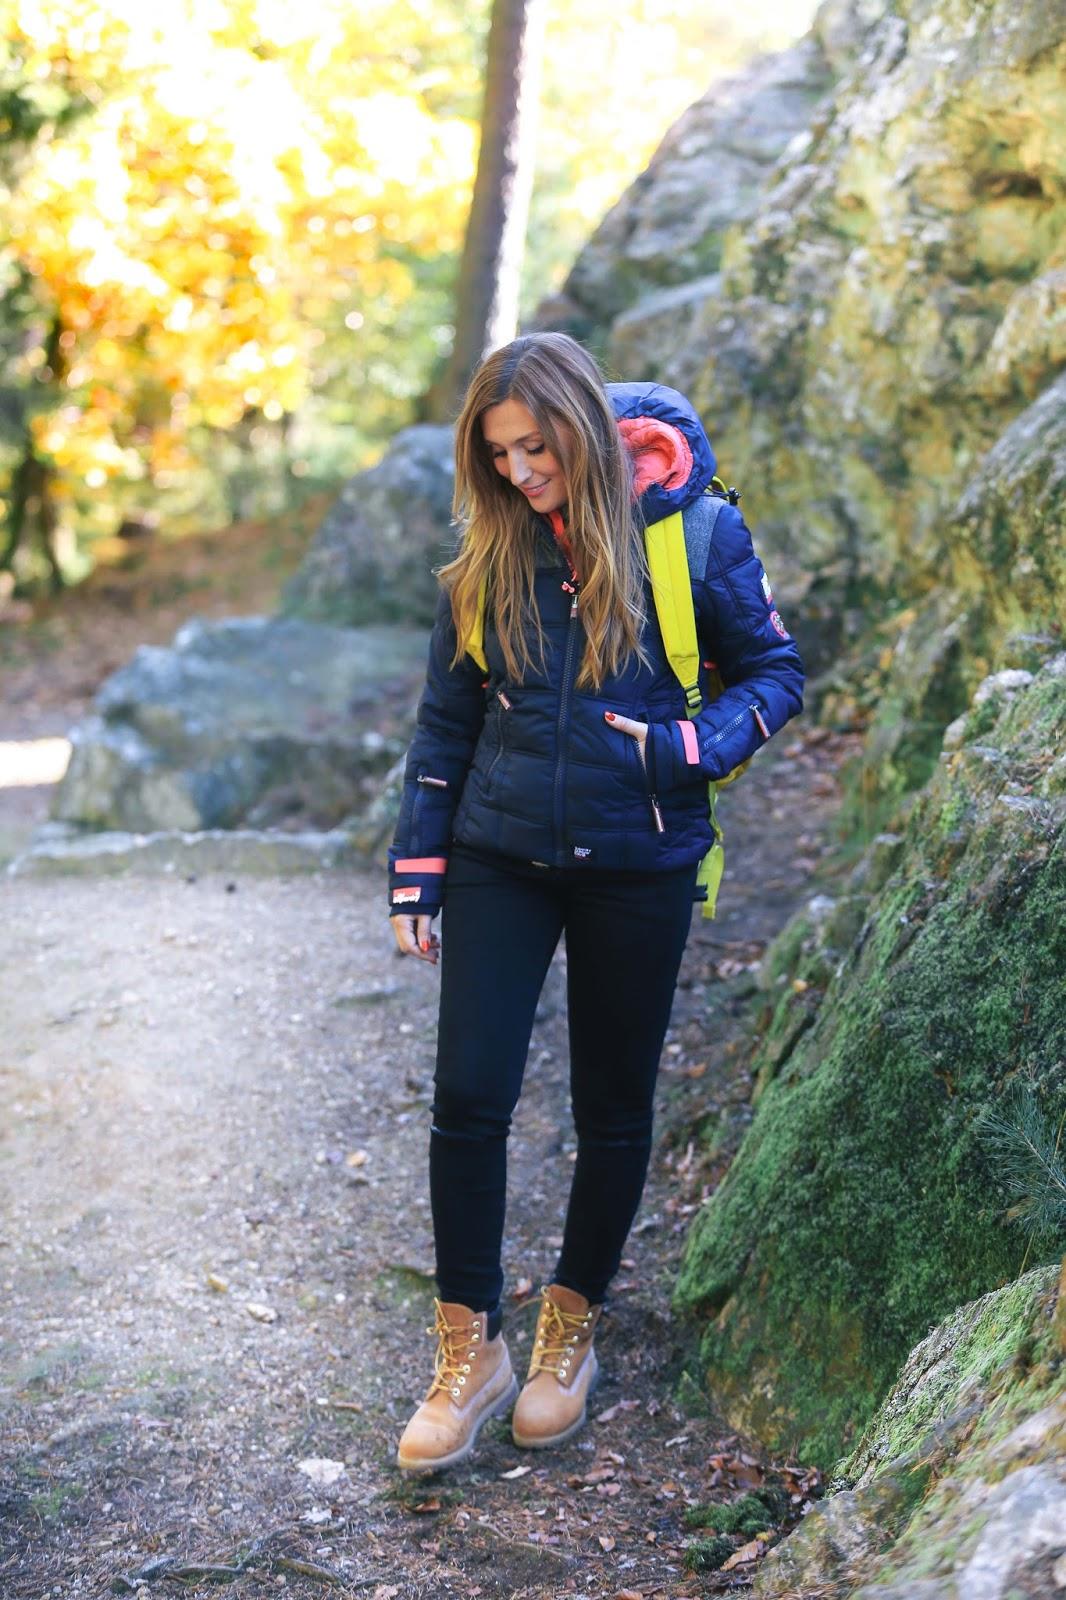 deutsche-outdoor-blogger-Hiking-Wandern-wanderlook-wander-outfit-Outdoorblogger-fashionstylebyjohanna-timberland-schuhe-Fashionstylebyjohanna